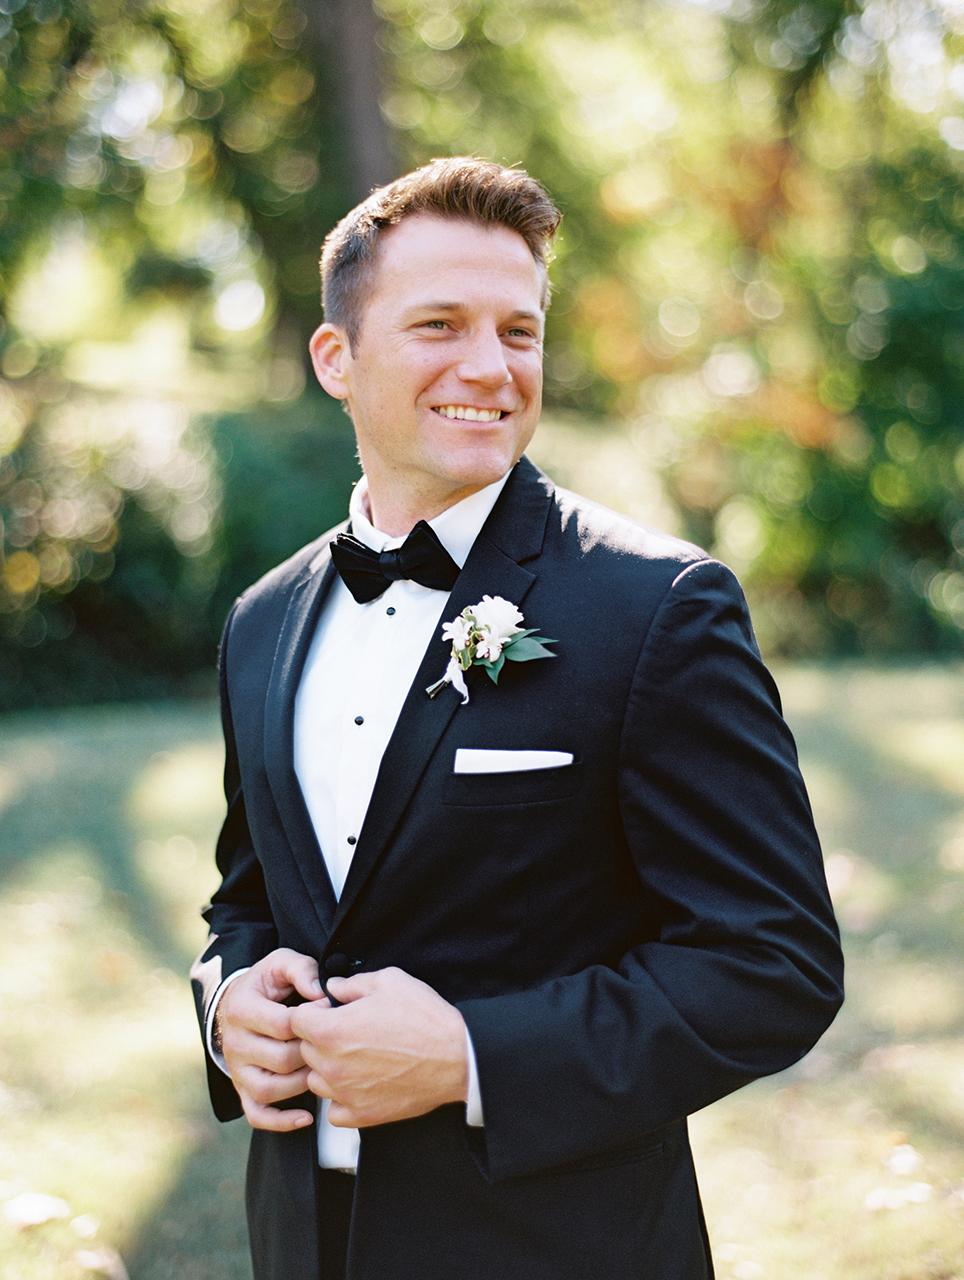 groom posing in black tuxedo outdoors